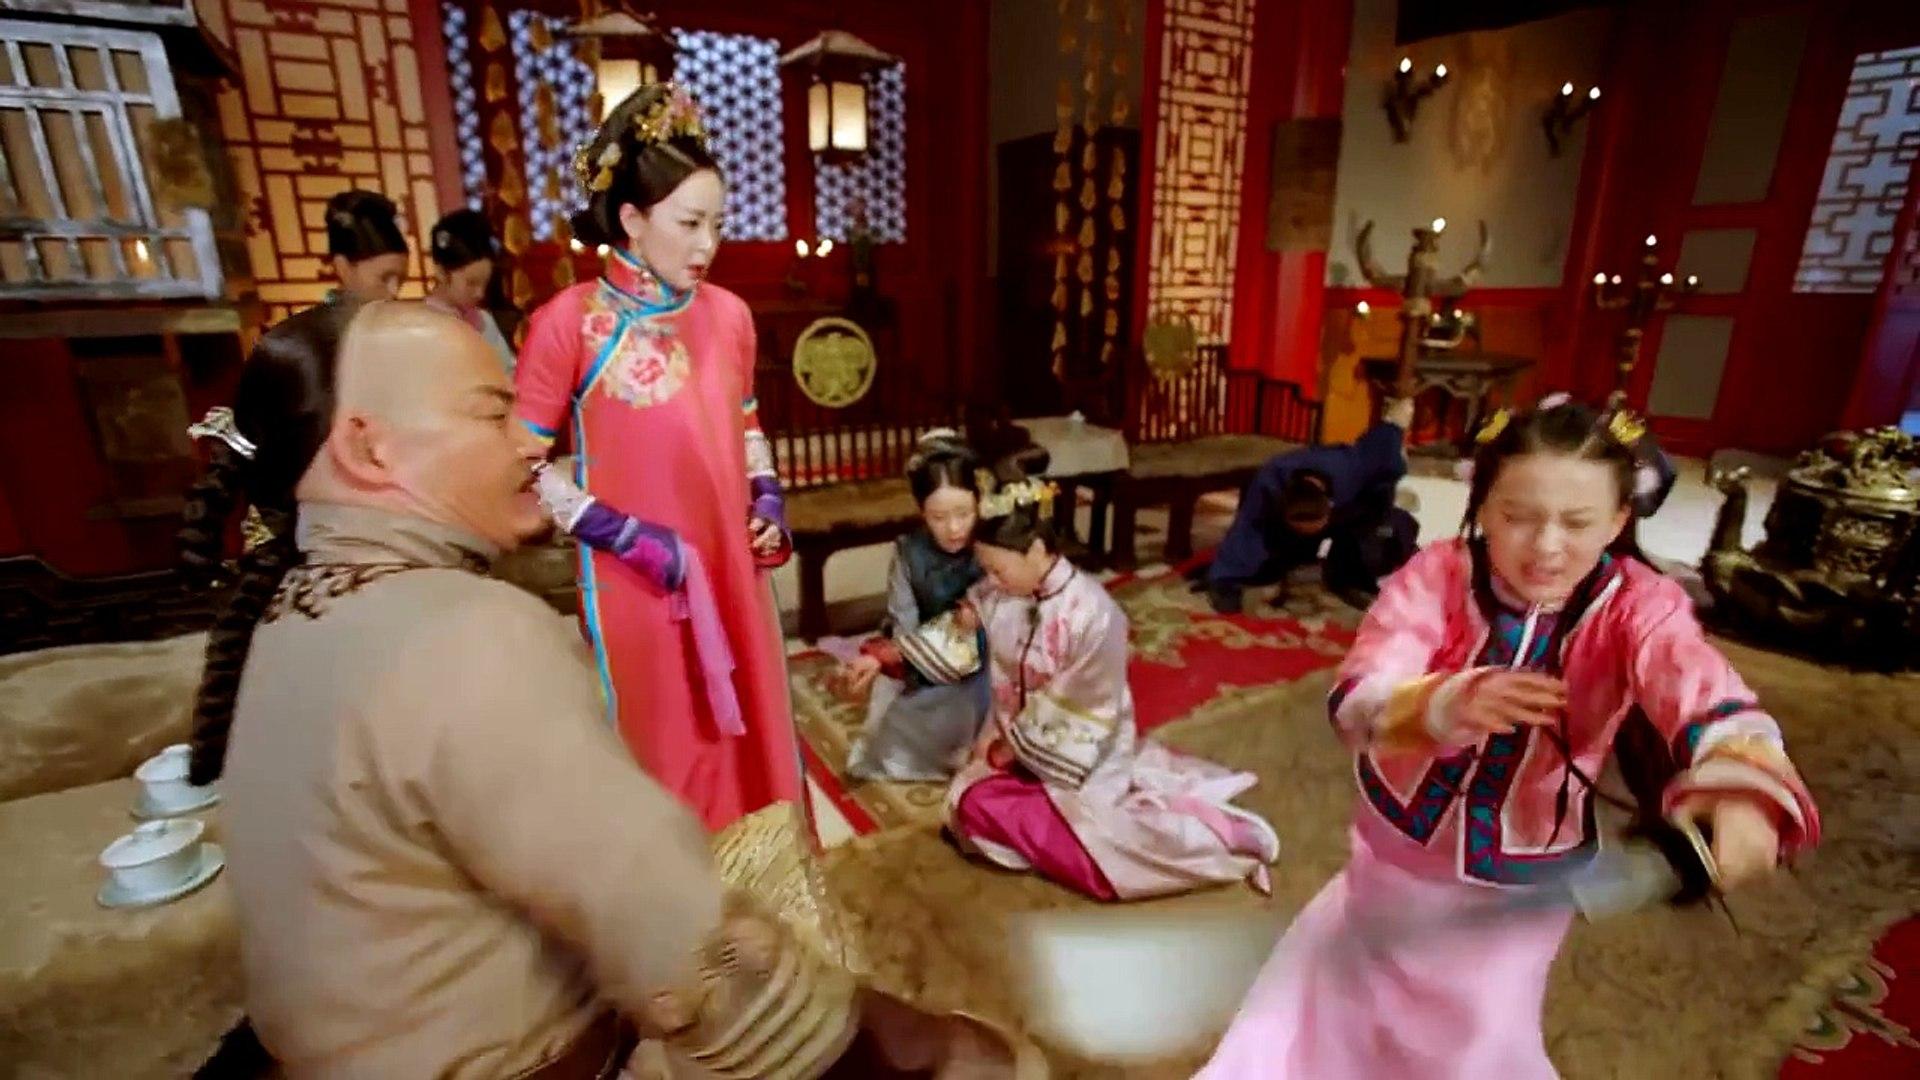 [ENG SUB] Rule the World Episode 1 EngSub | 独步天下 Du Bu Tian Xia Chinese  Drama 2017 With English Subtitles